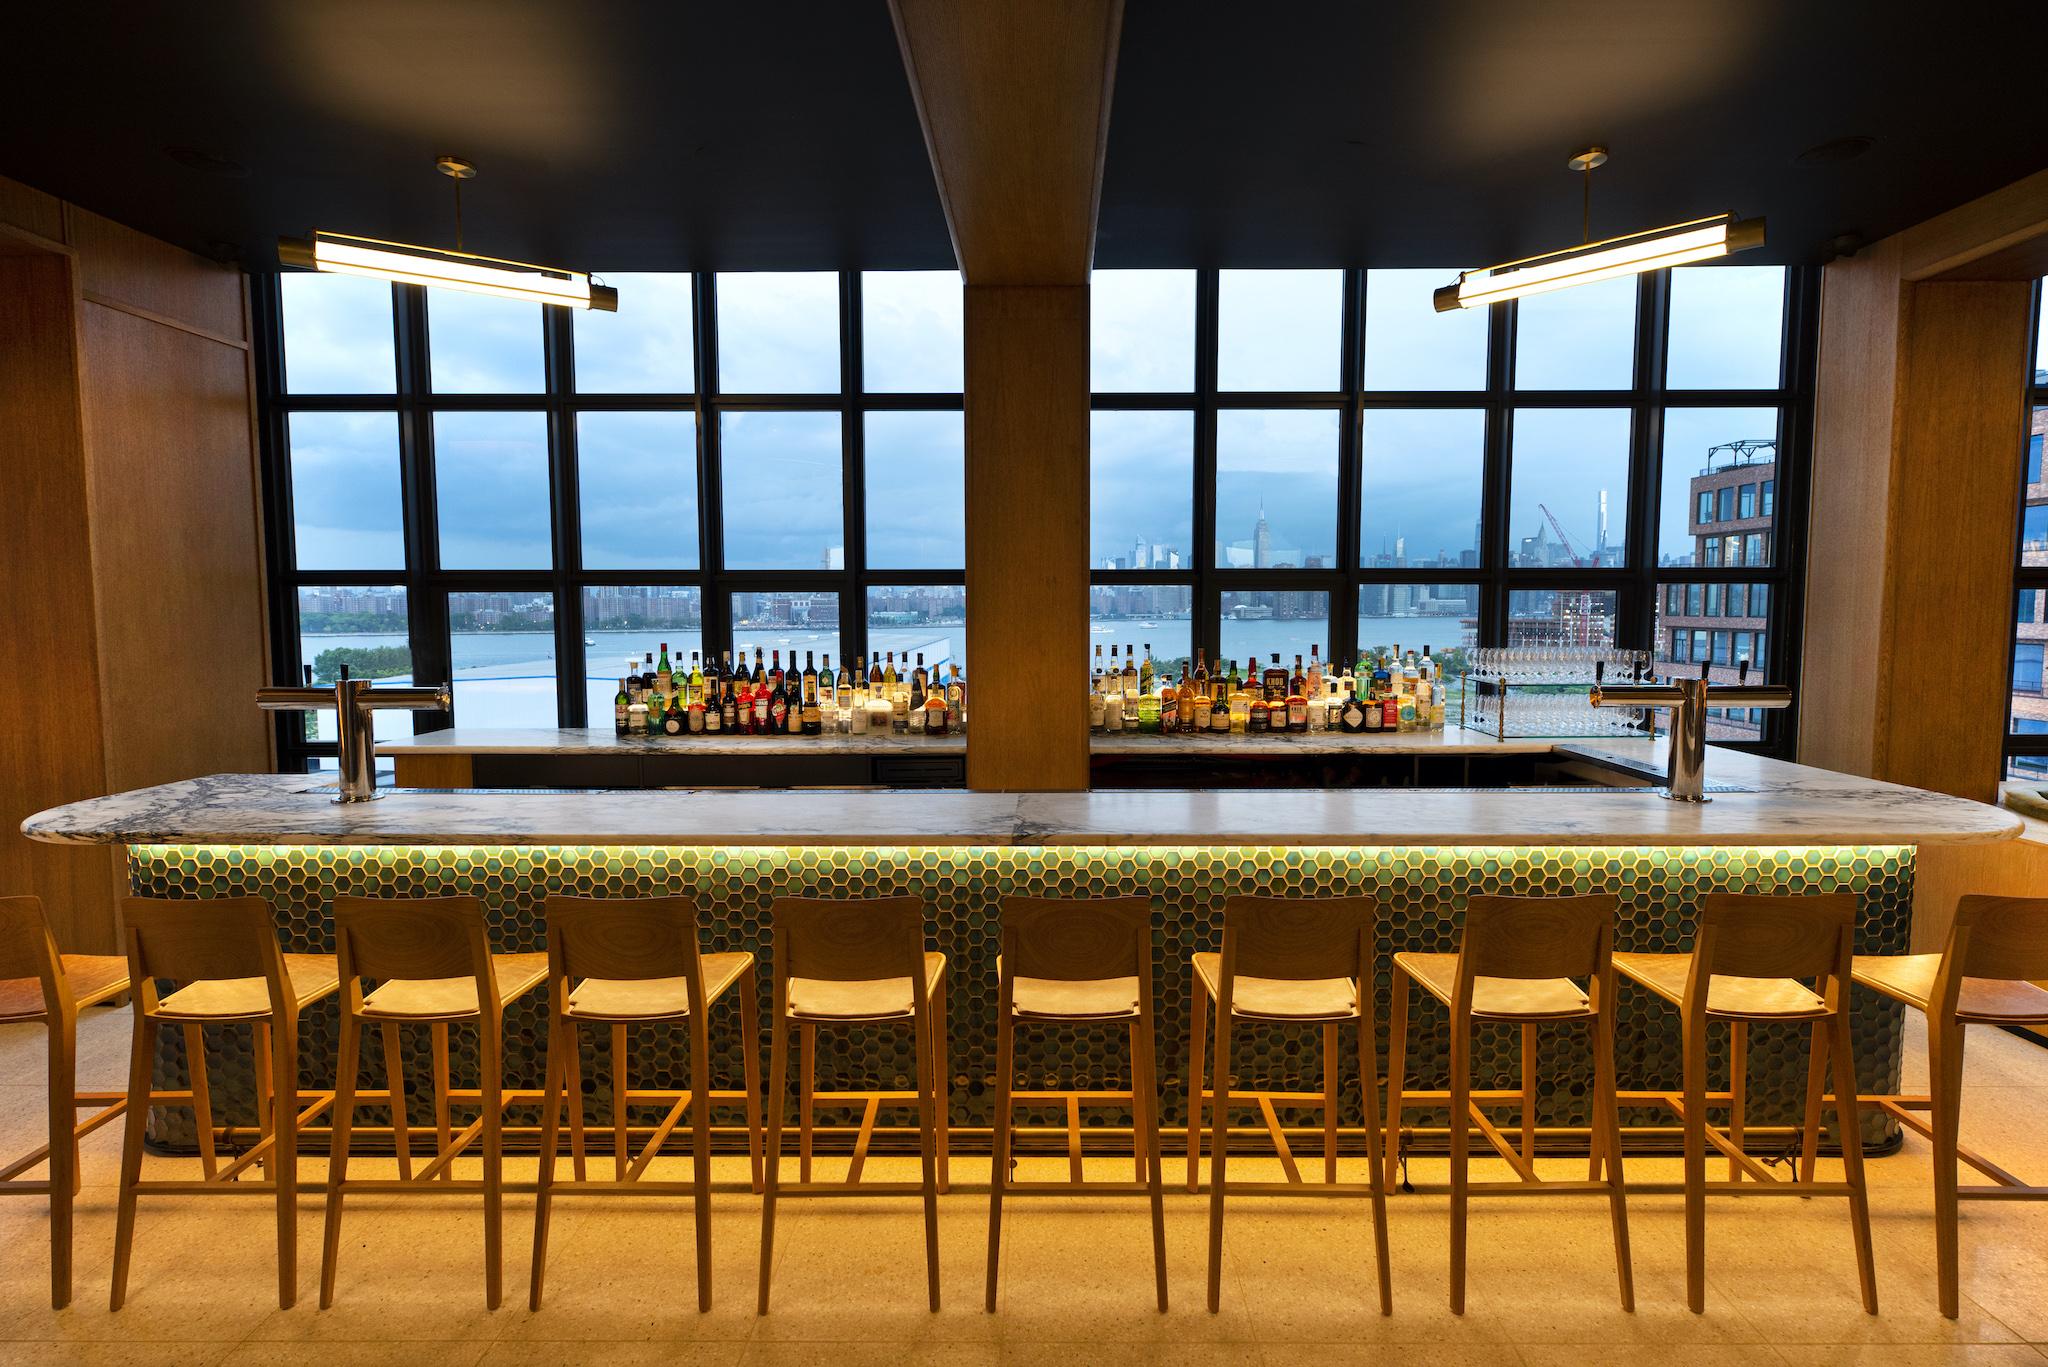 Brooklyn bar with Manhattan views